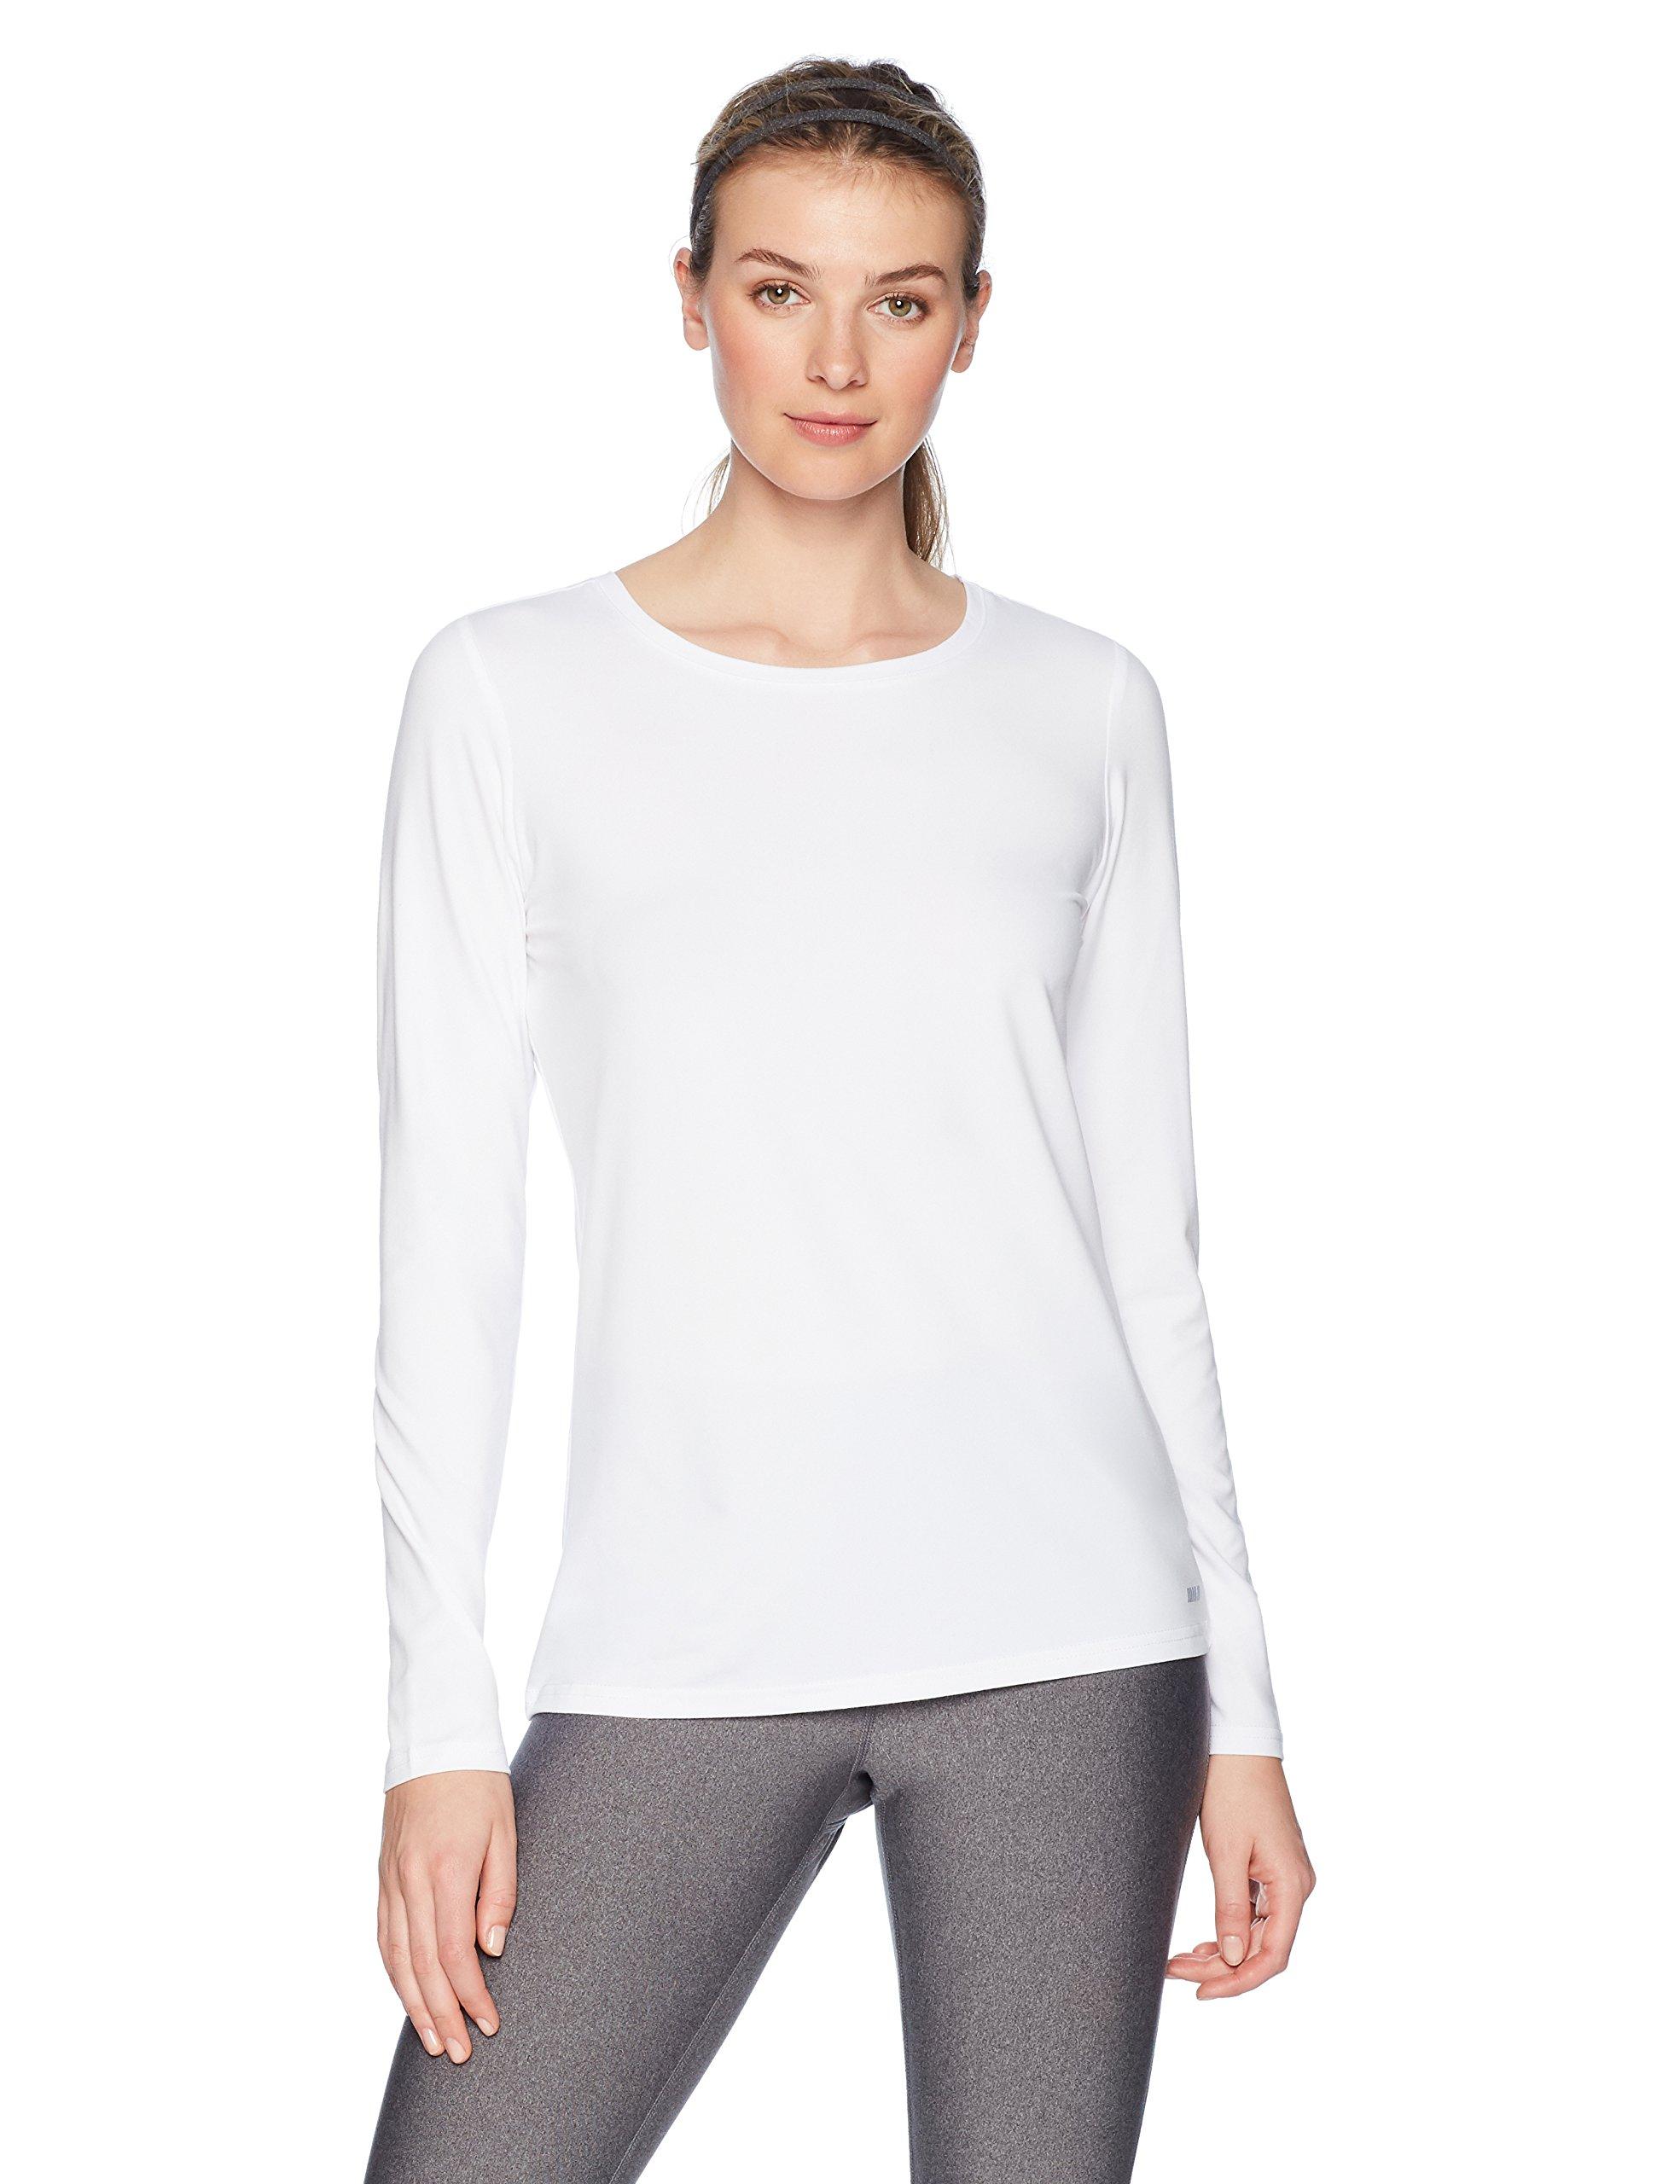 Amazon Essentials Women's Standard Tech Stretch Long-Sleeve T-Shirt, White, Large